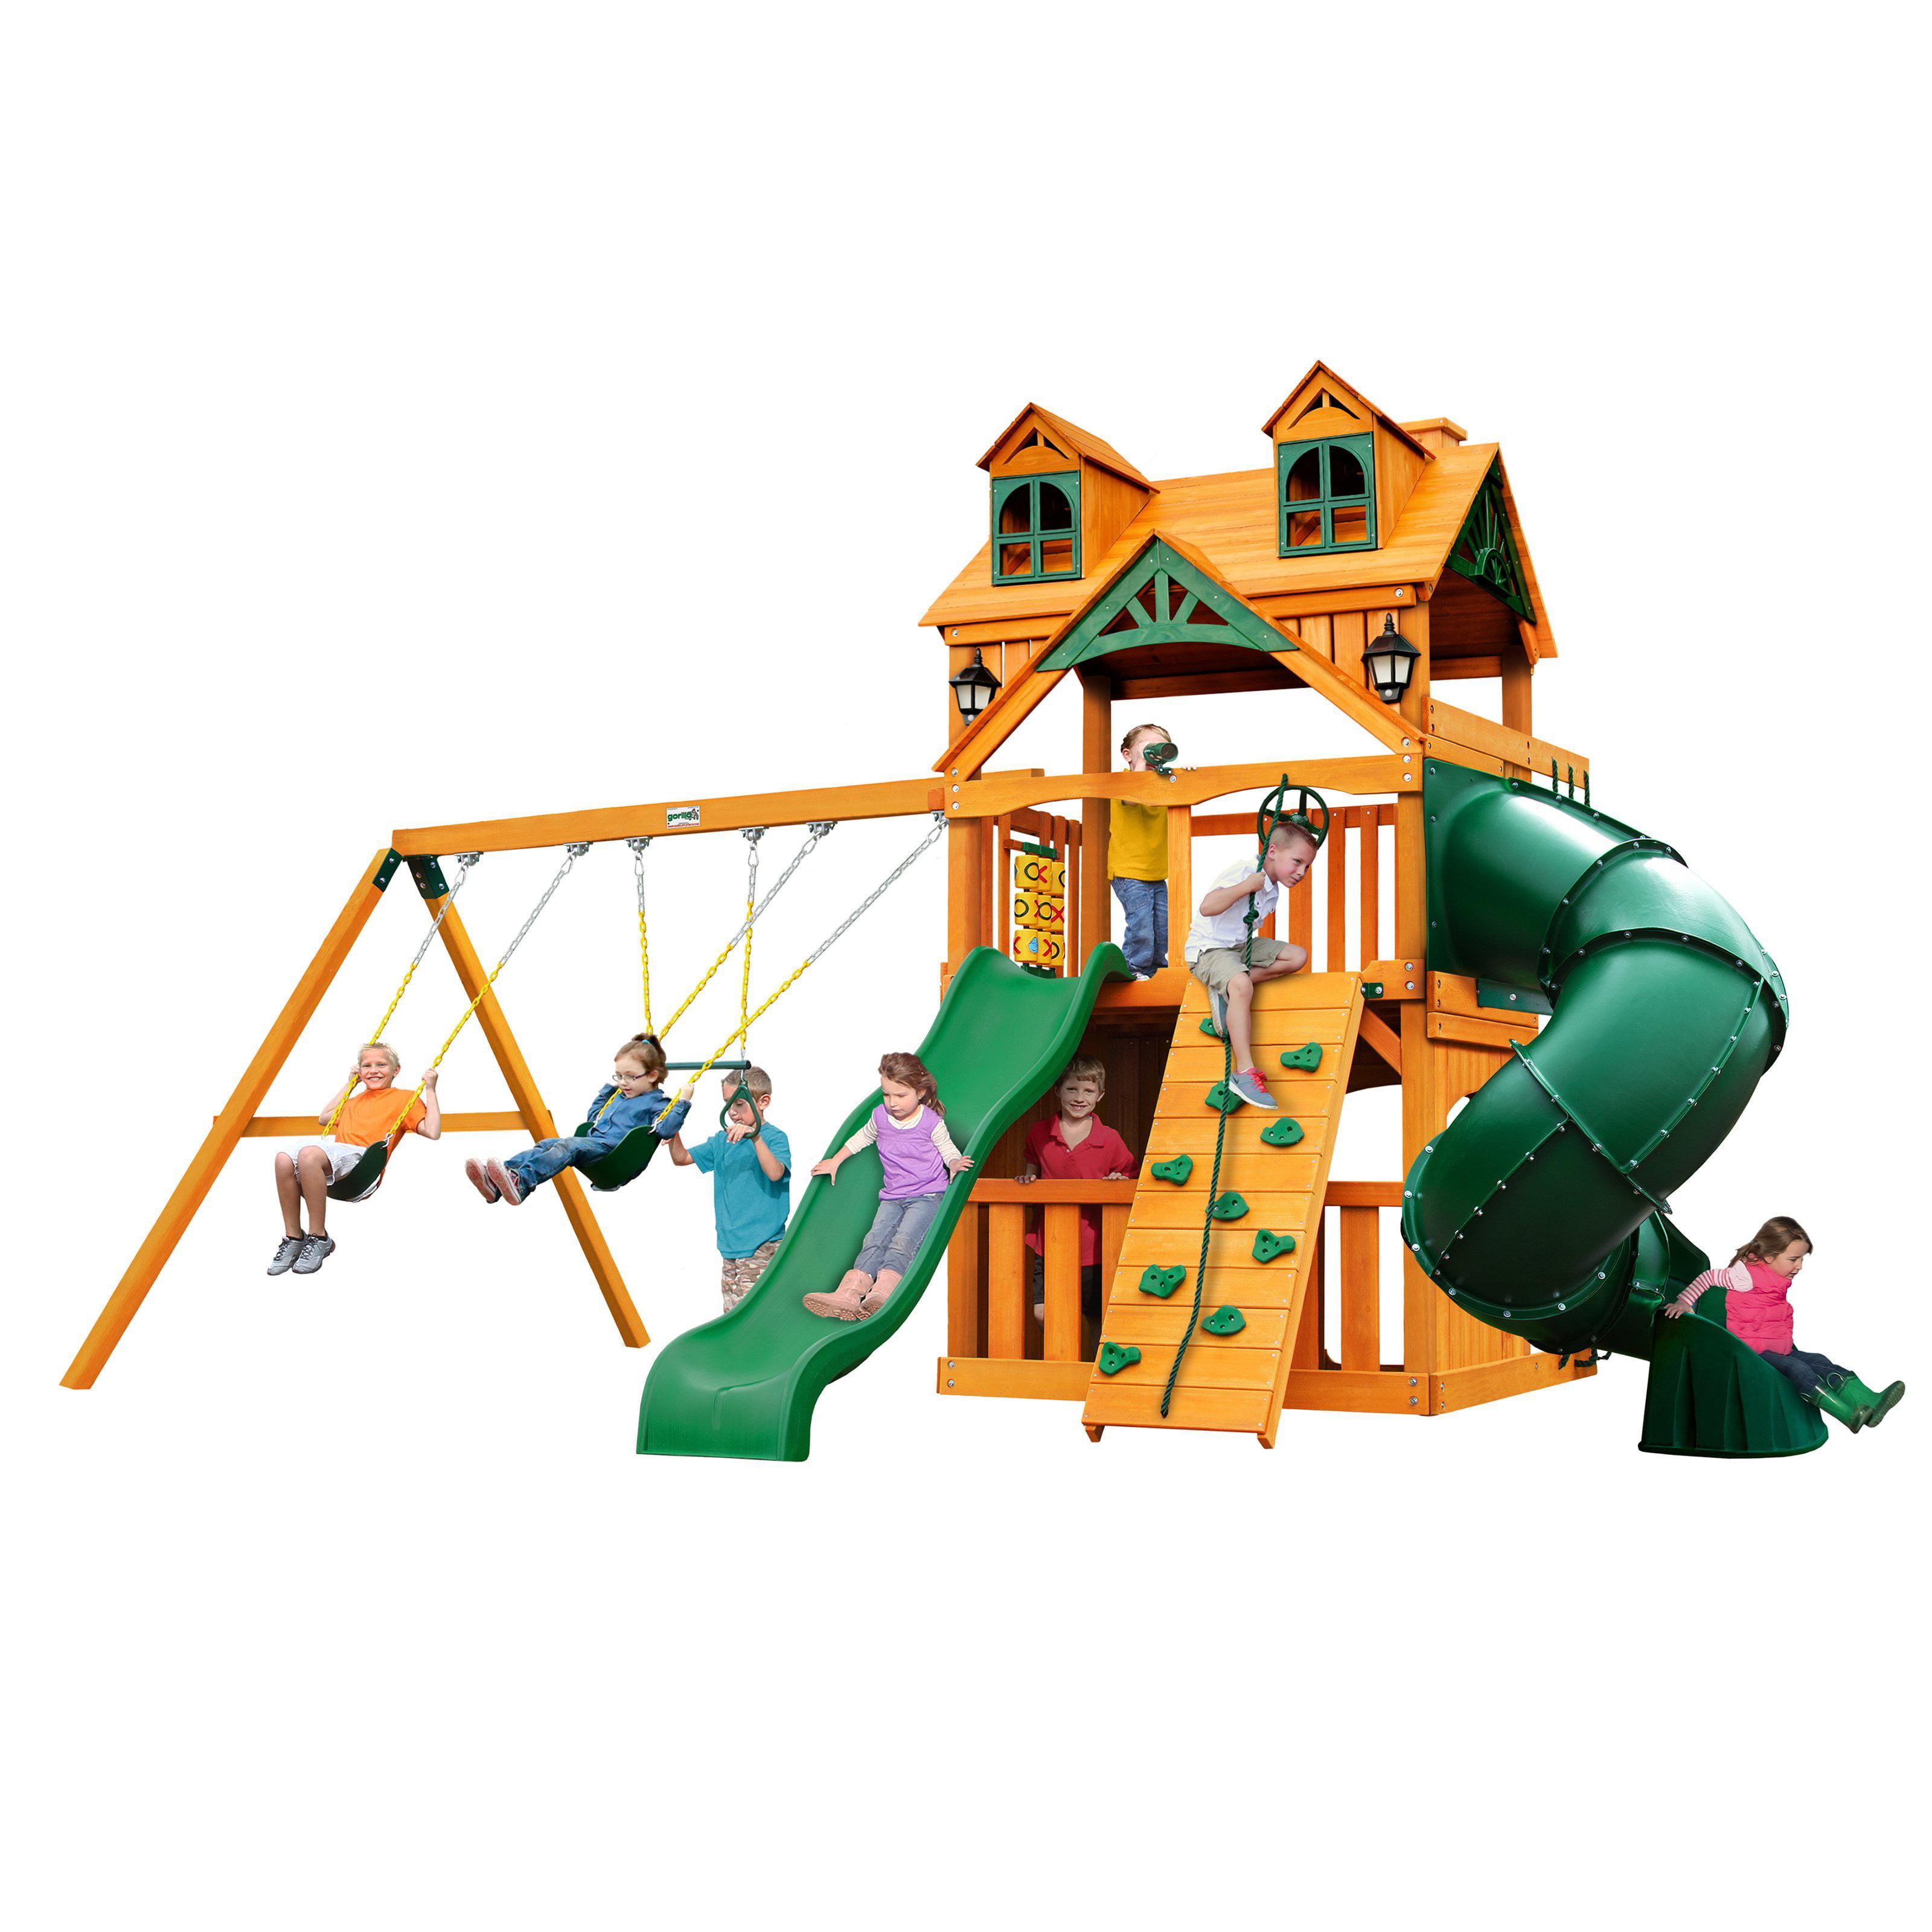 Gorilla Playsets Malibu Extreme Clubhouse Swing Set w  Amber Posts by Gorilla Playsets